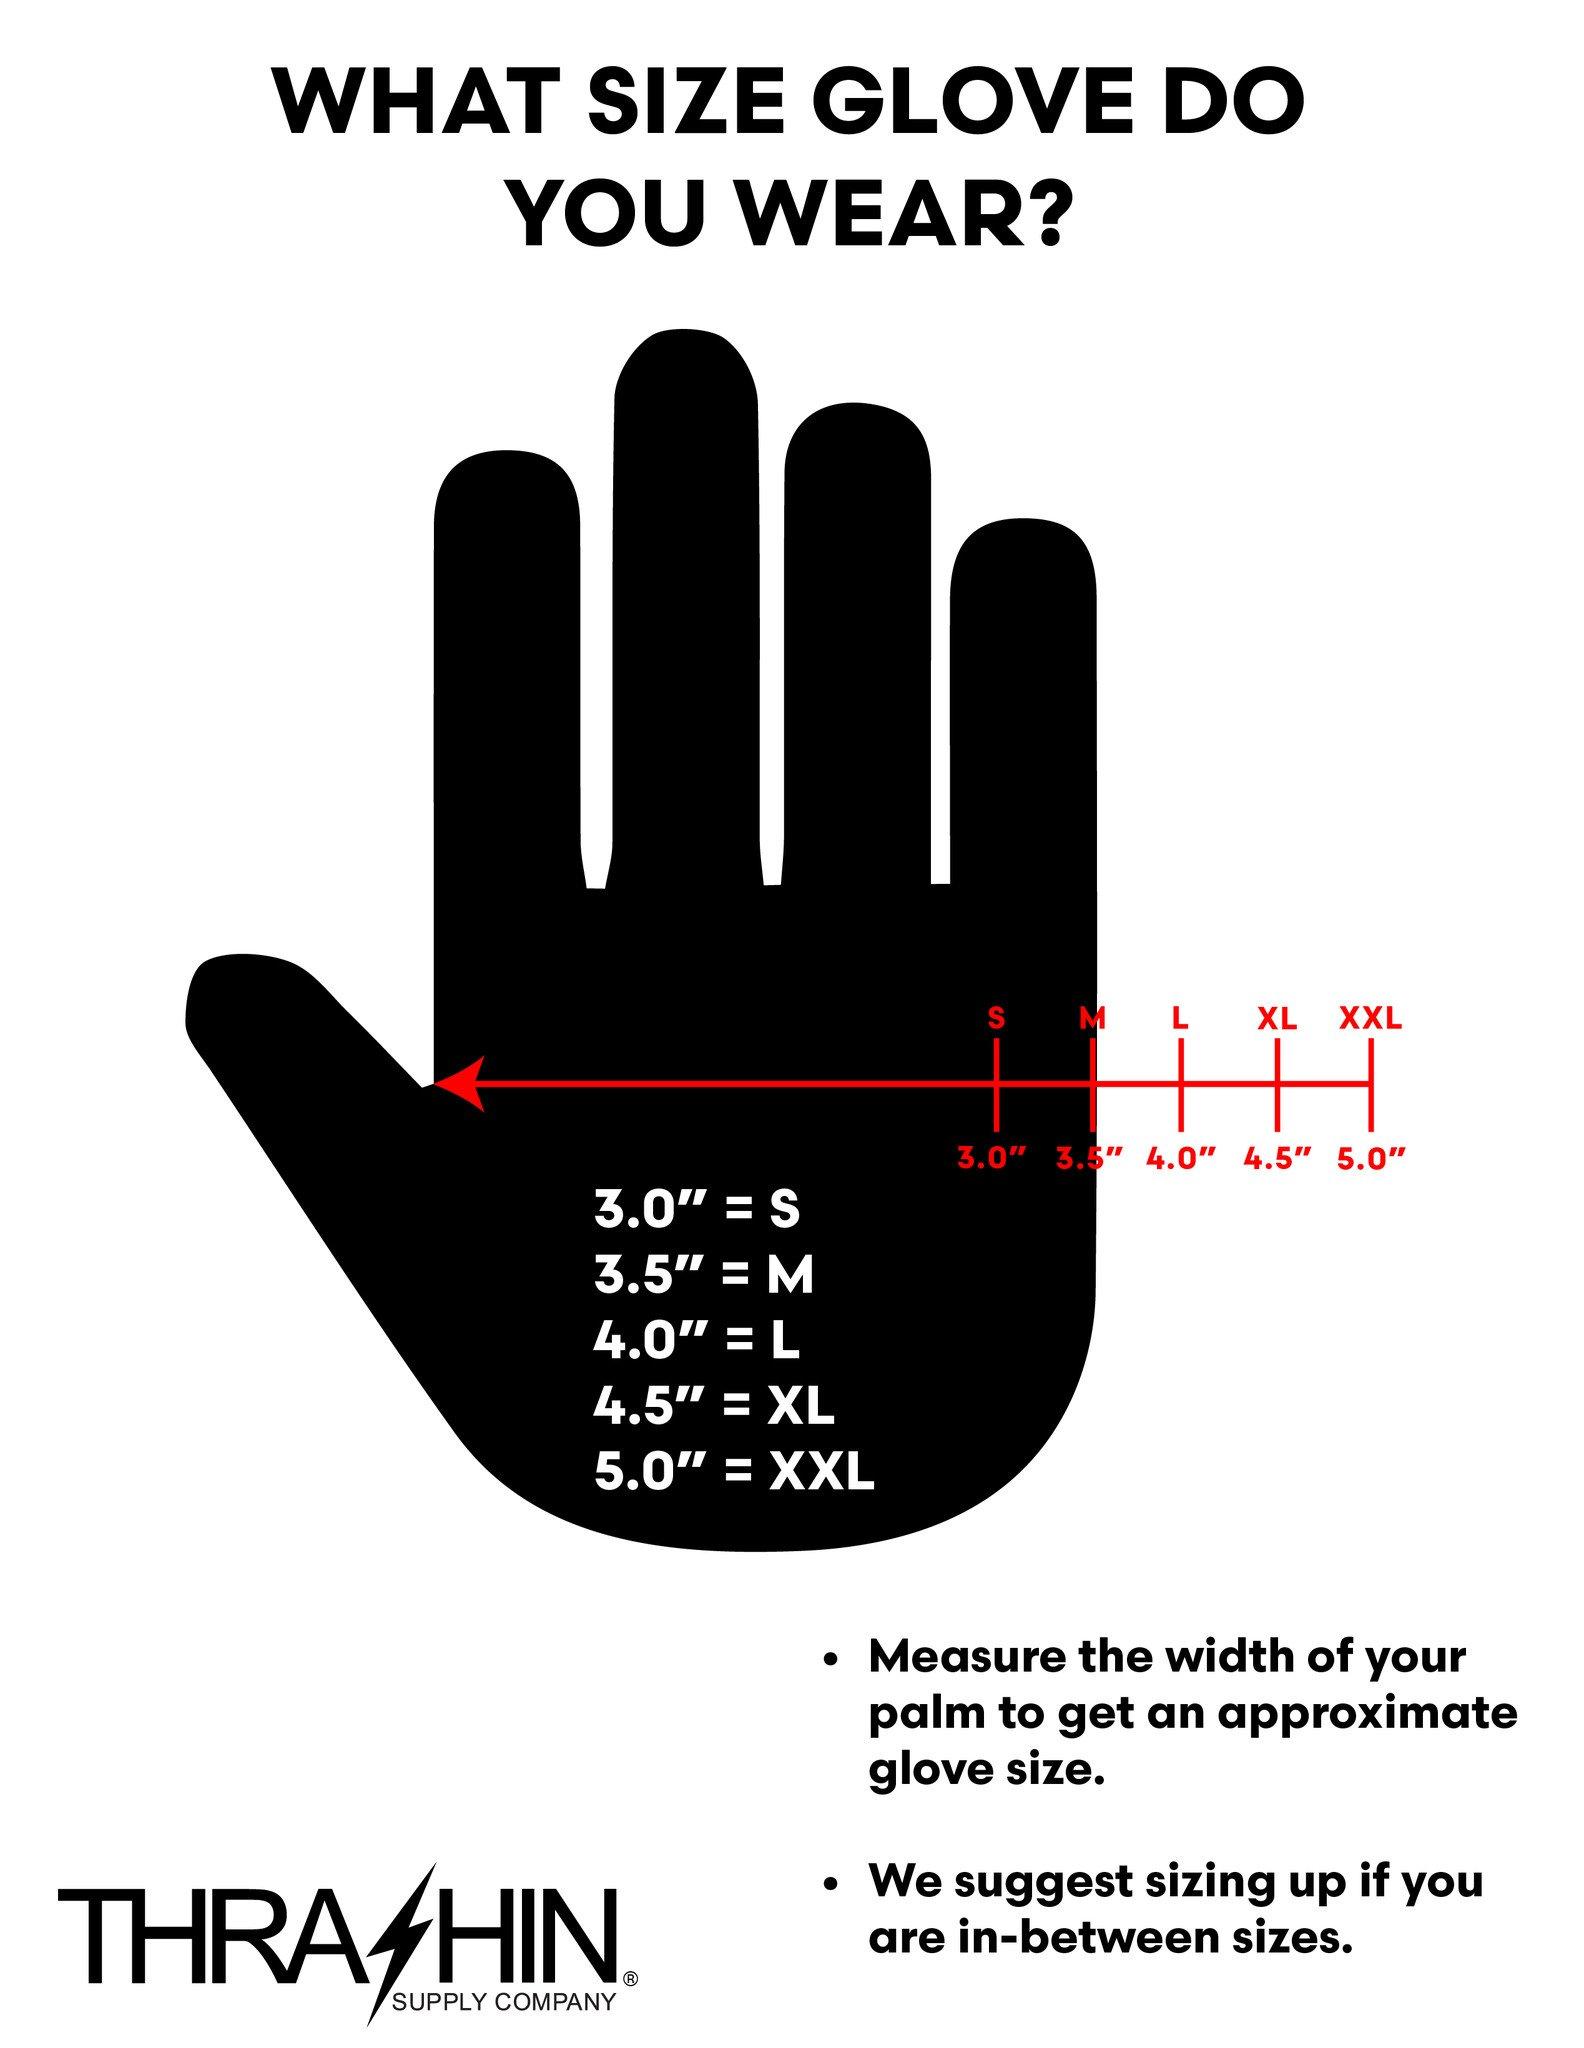 tc-glove-size-chart-322910e5-e08f-4c96-a8e1-6d4c4b0e72d7.jpg